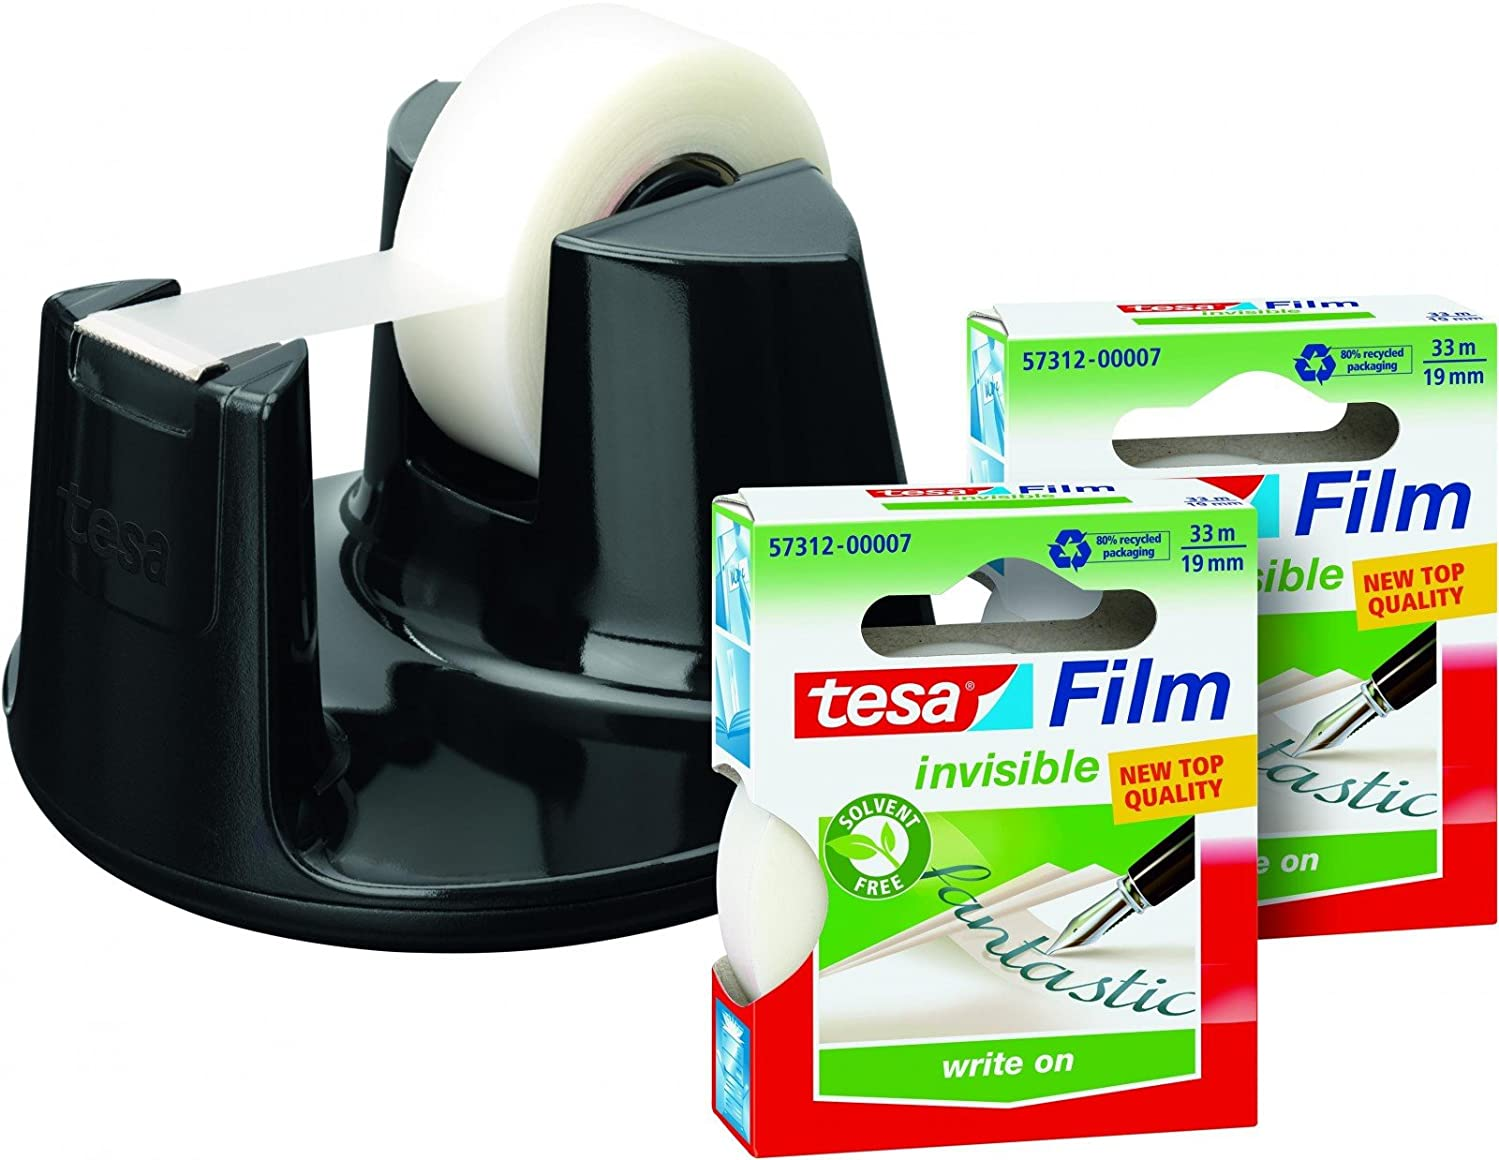 Tesa Easy Cut Compact Promo Value Pack Tesafilm Eco & Clear 2?X 33?M: 19?mm + Dispenser